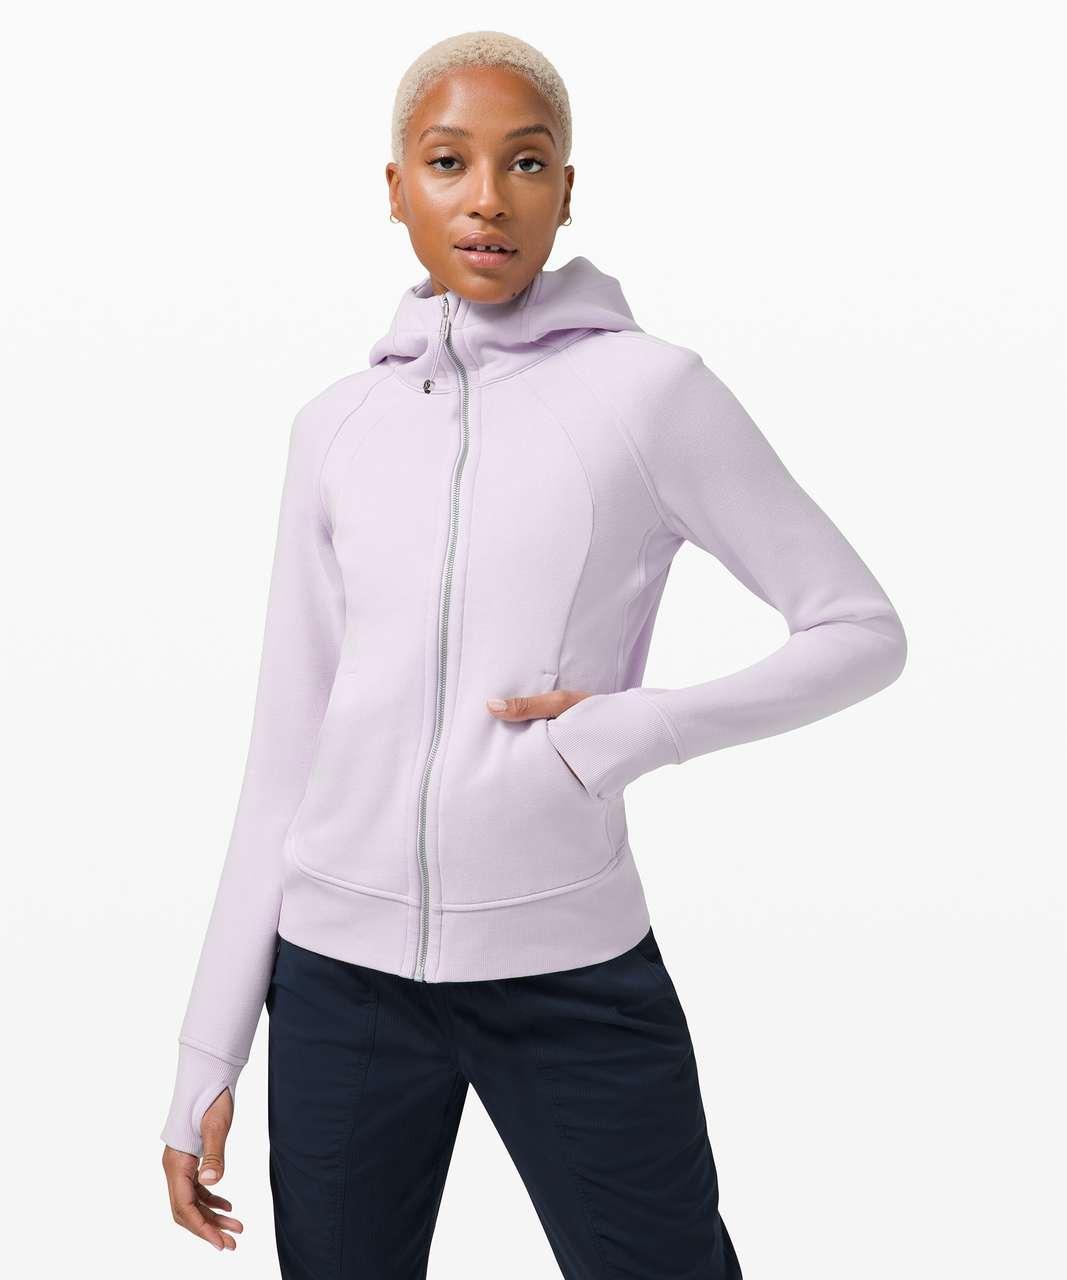 Lululemon Scuba Hoodie *Light Cotton Fleece - Lavender Dew